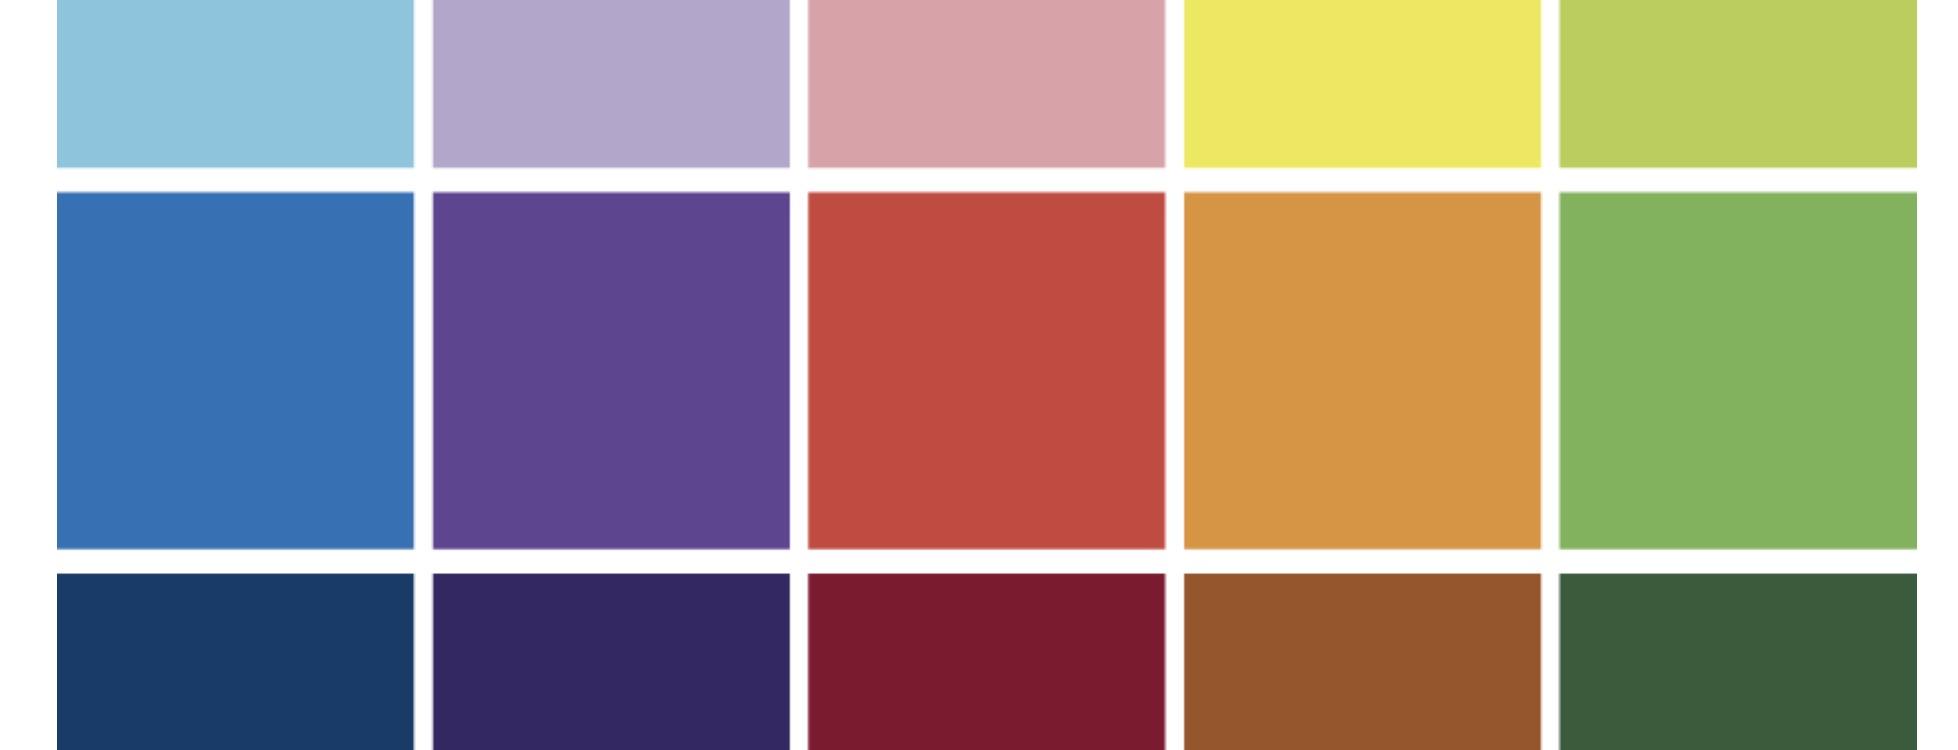 paleta de color guia de marca